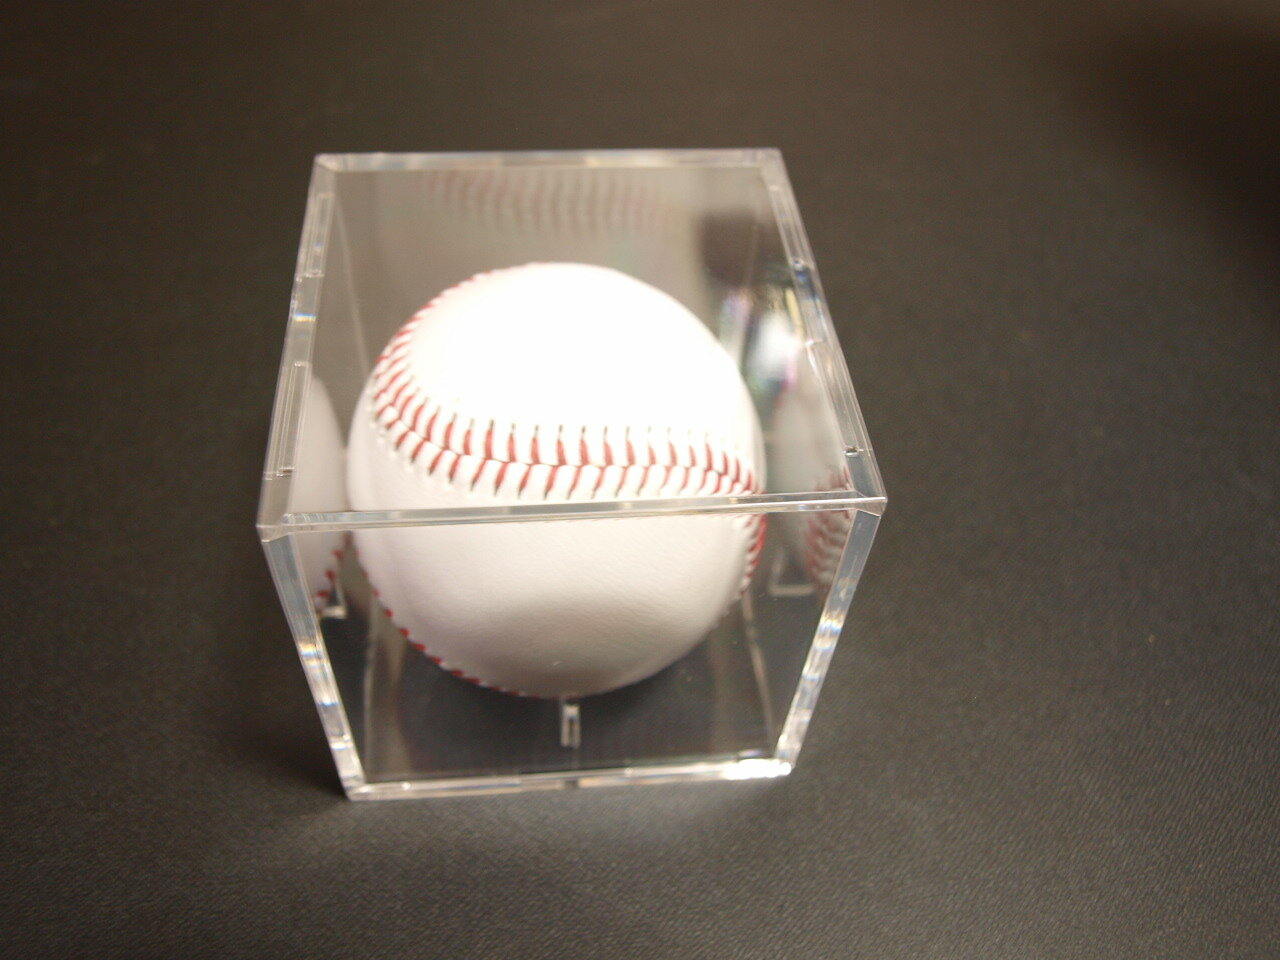 UltraPro UVケア カット!記念サインボールケース用コレクションケース!野球用品/記念グッズ/野球ボール/硬球、軟球/野球用品/ キャンプ用にも